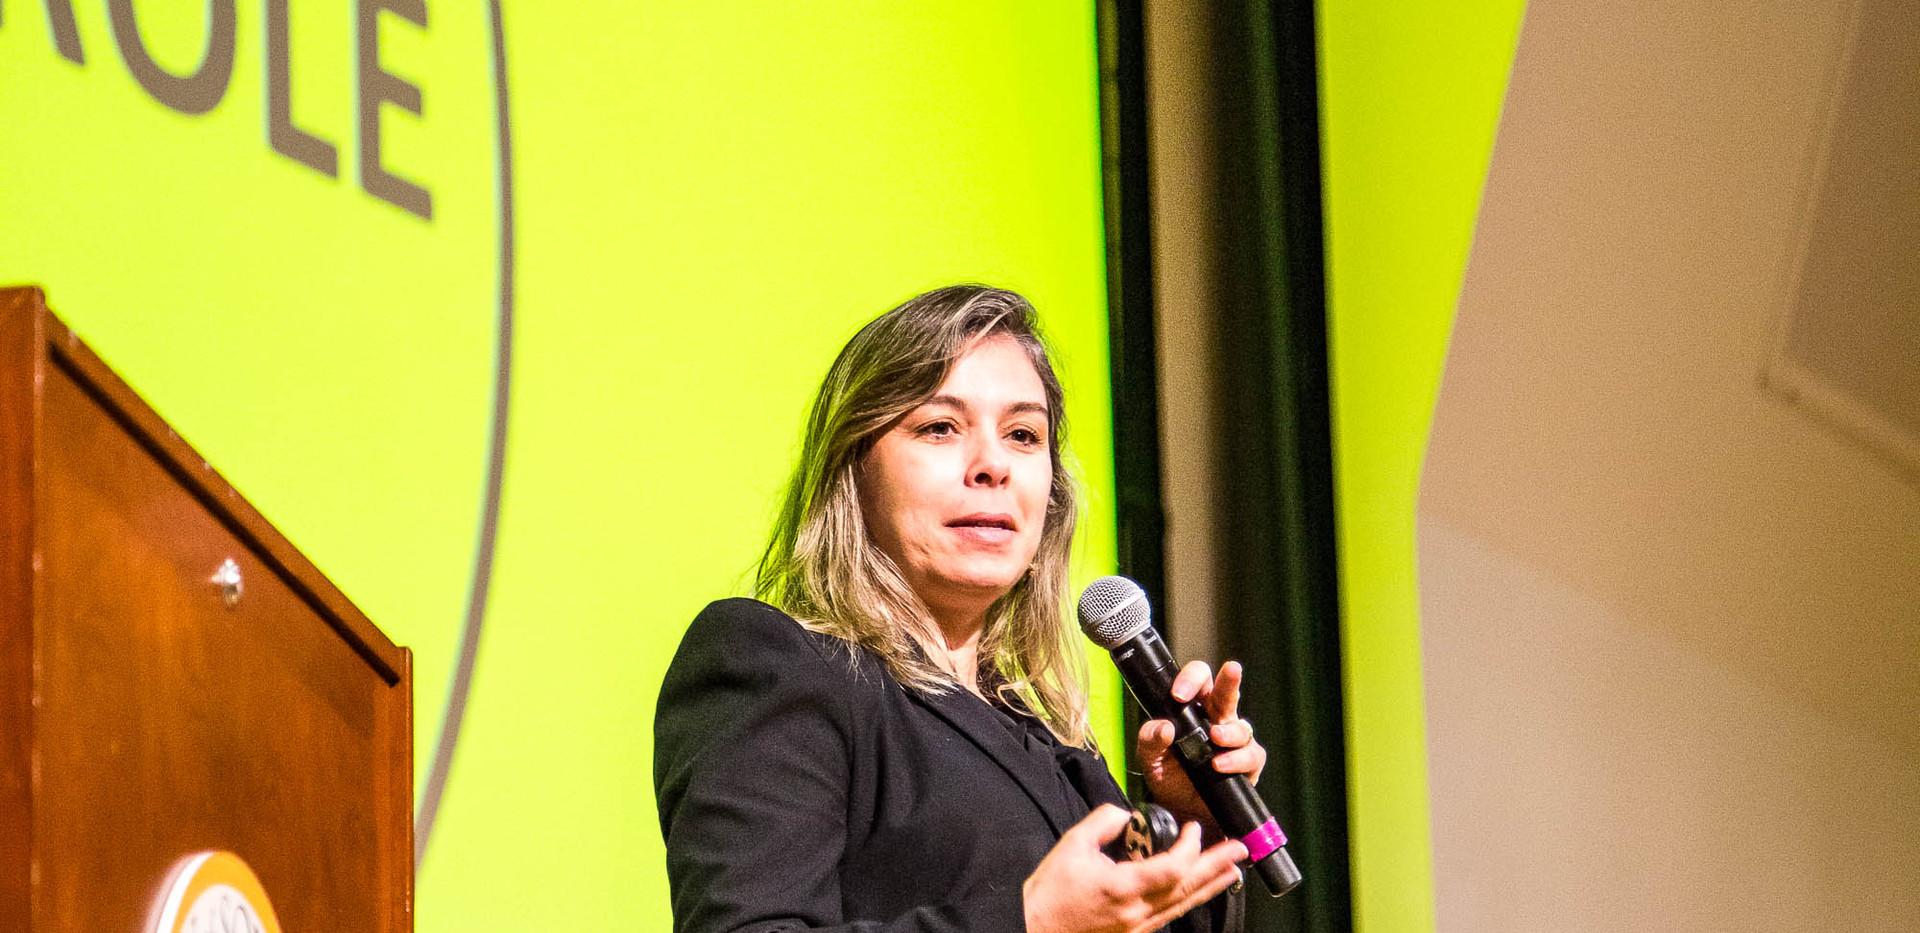 Brazil-FloridaStudentConference-76.jpg